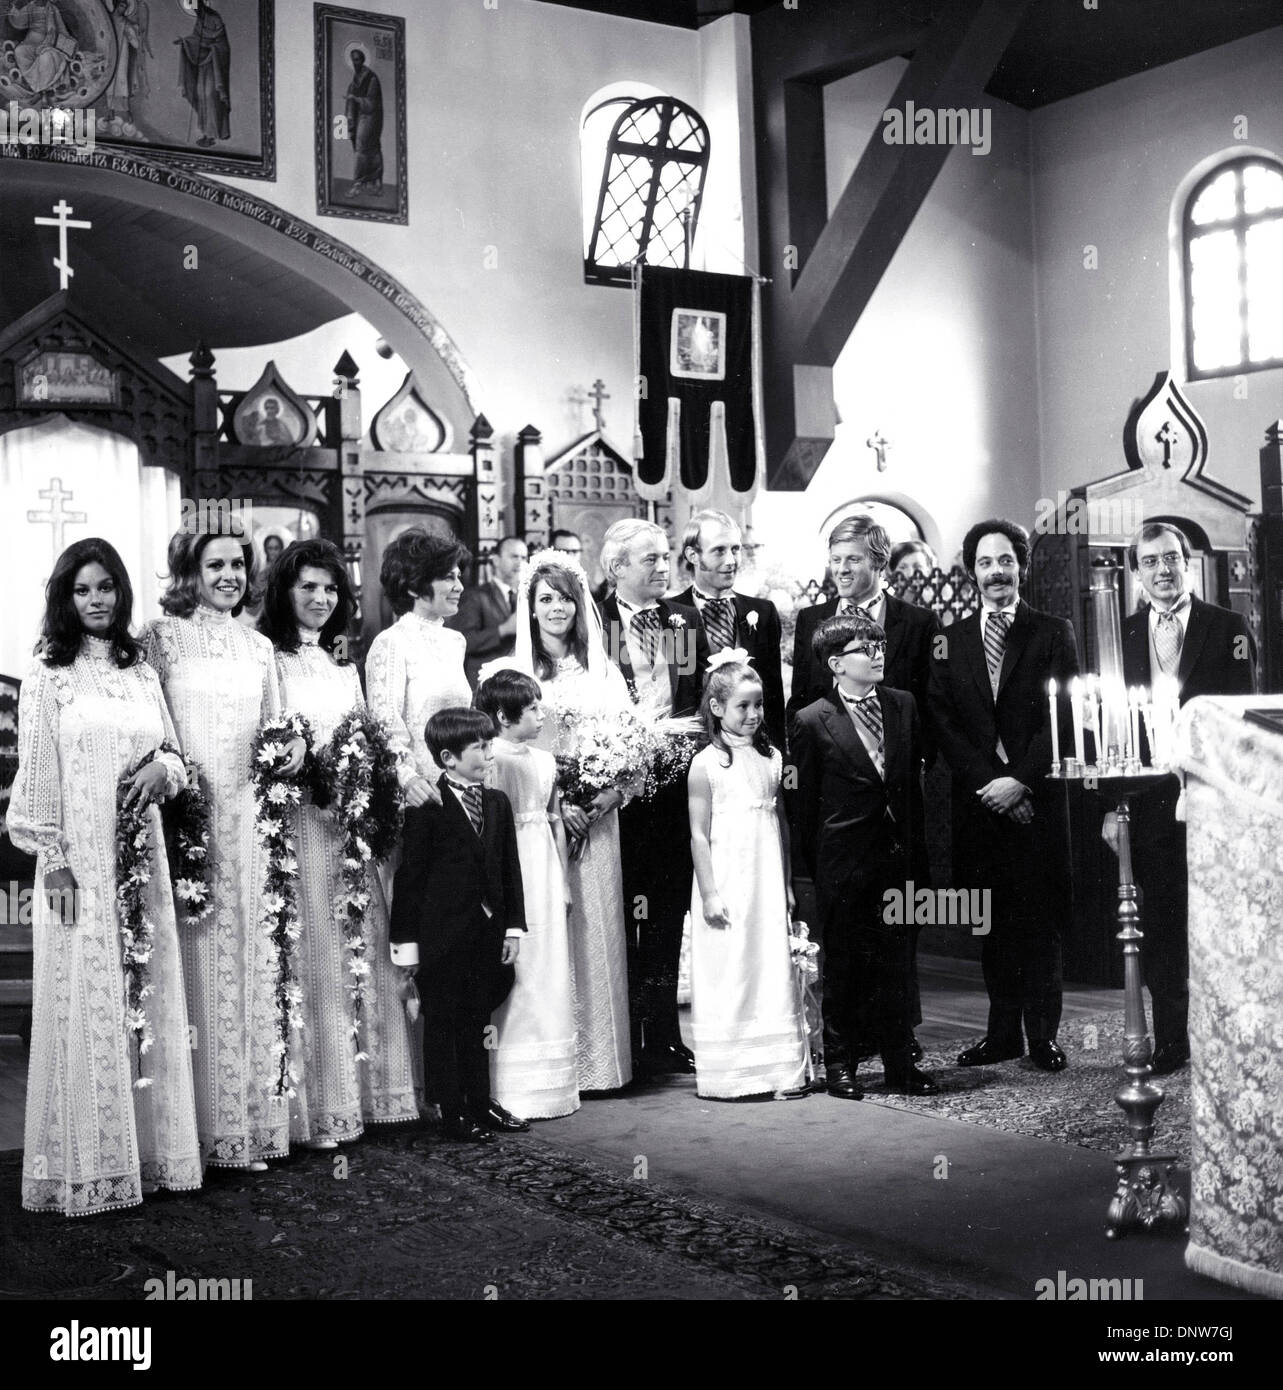 oct 16 2002 natalie wood and richard gregson wedding